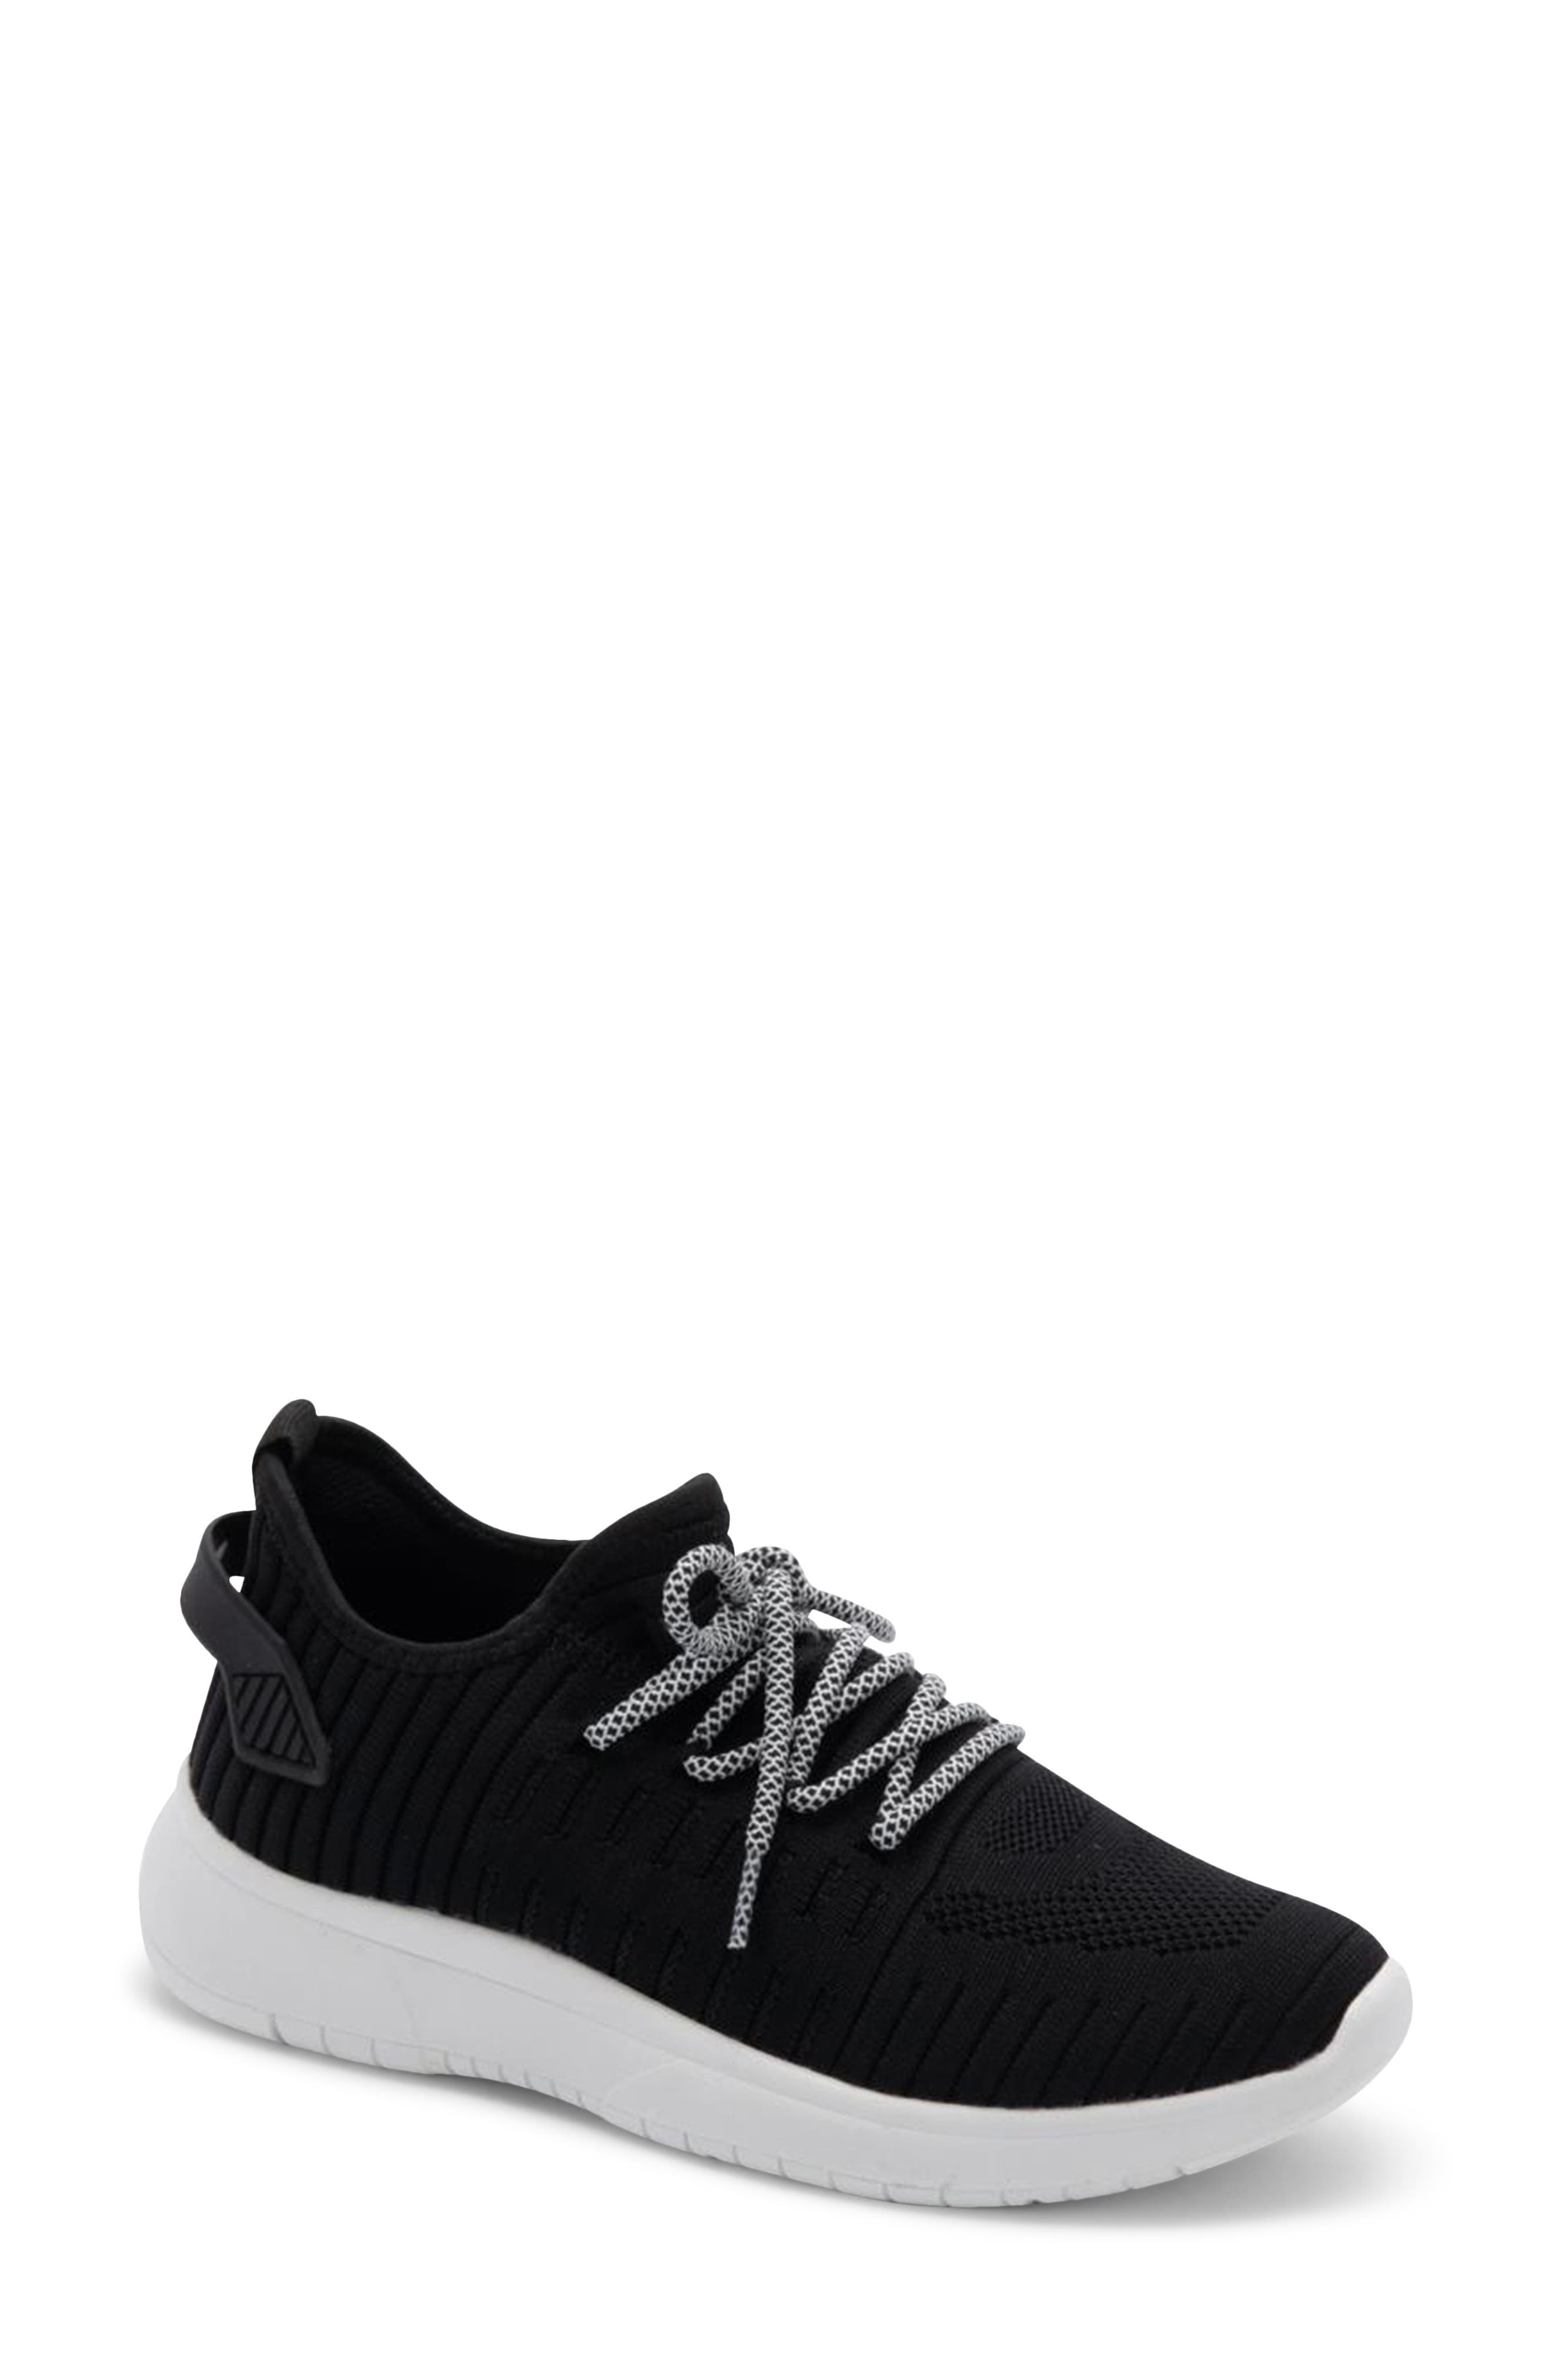 Kamie Waterproof Knit Sneaker